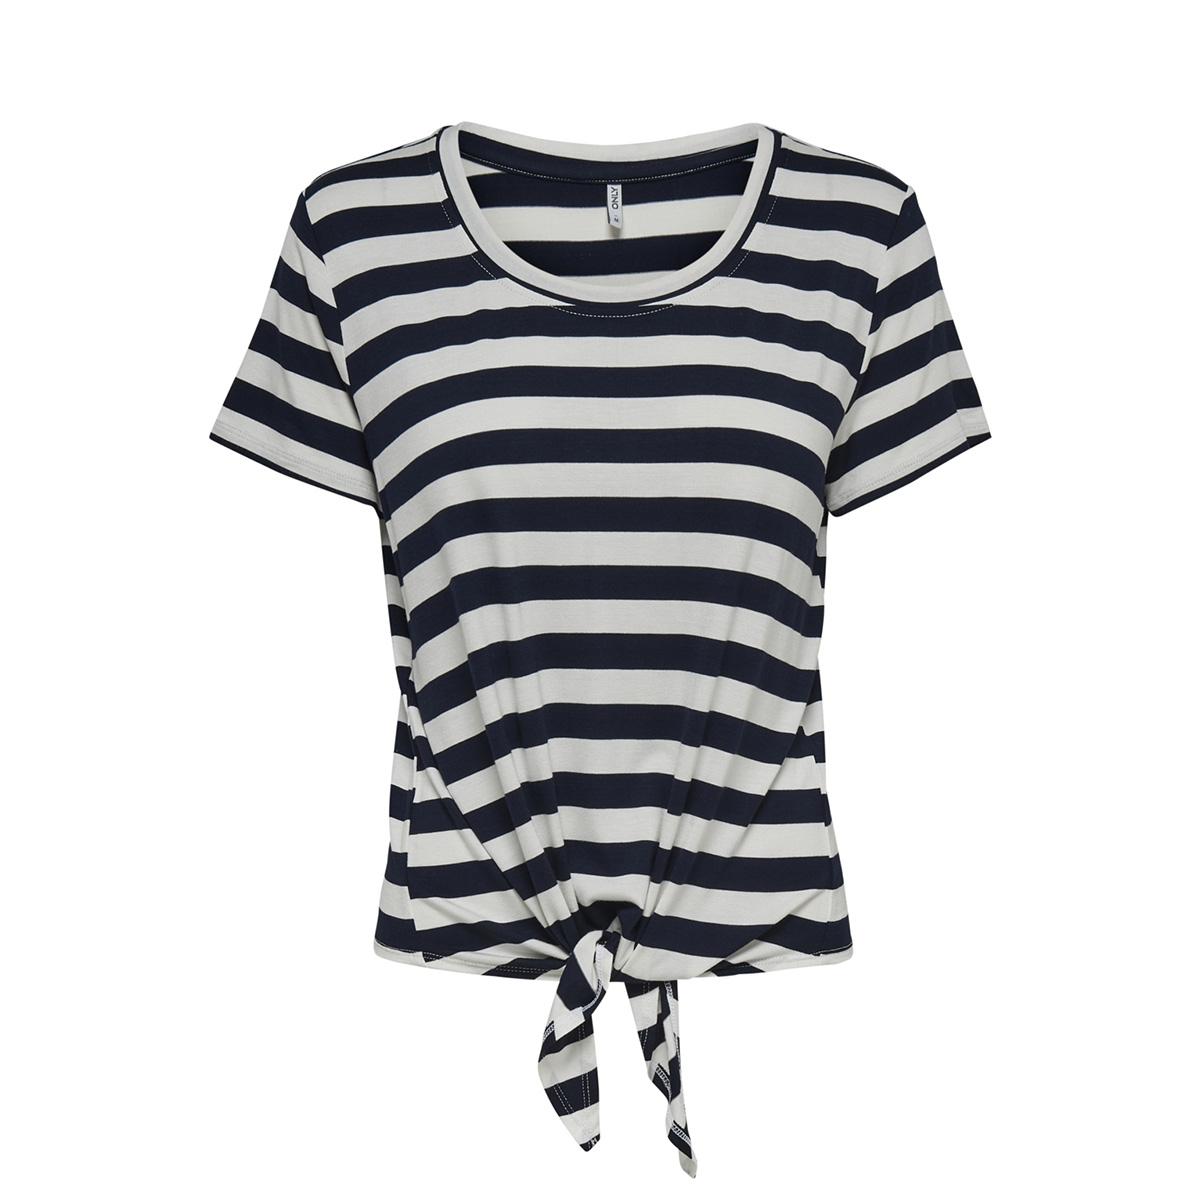 nlarli s/s knot top jrs noos 15178088 only t-shirt cloud dancer/night sky